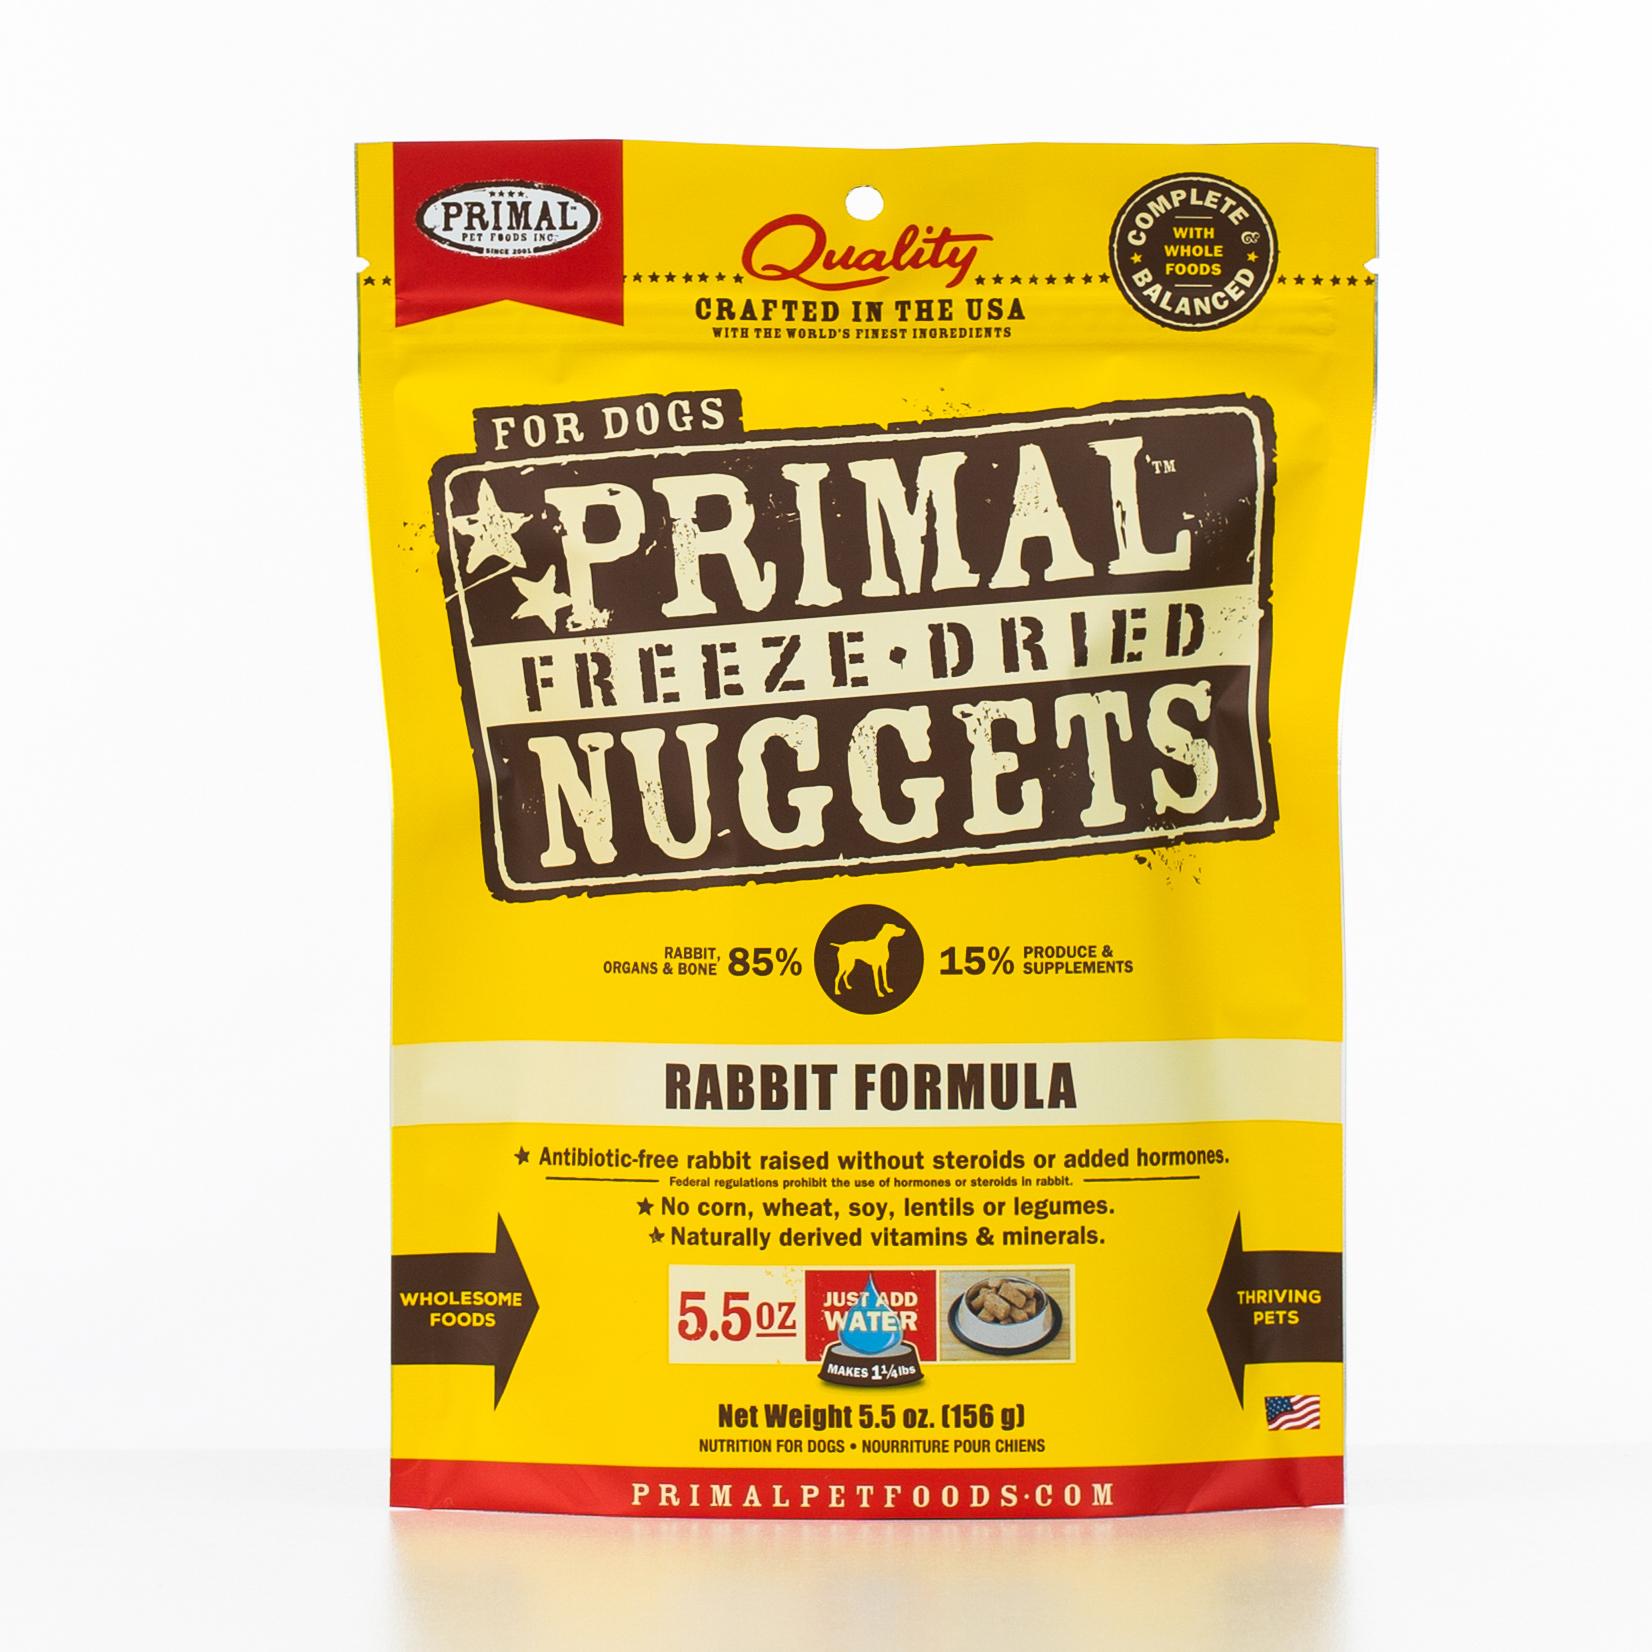 Primal Raw Freeze-Dried Nuggets Rabbit Formula Dog Food Image